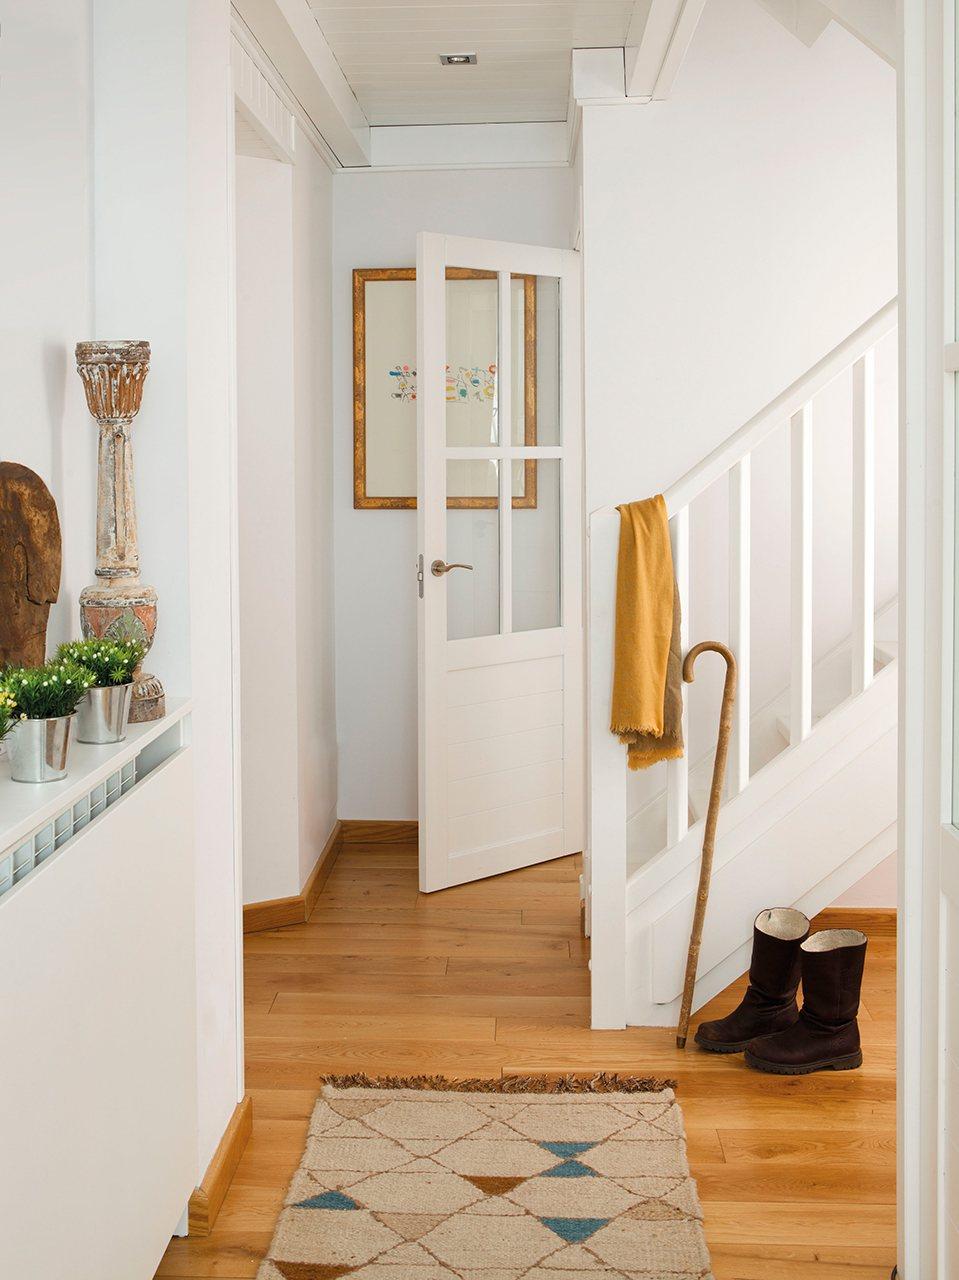 Olaimar decor el pisito 18 - Salones con escaleras ...